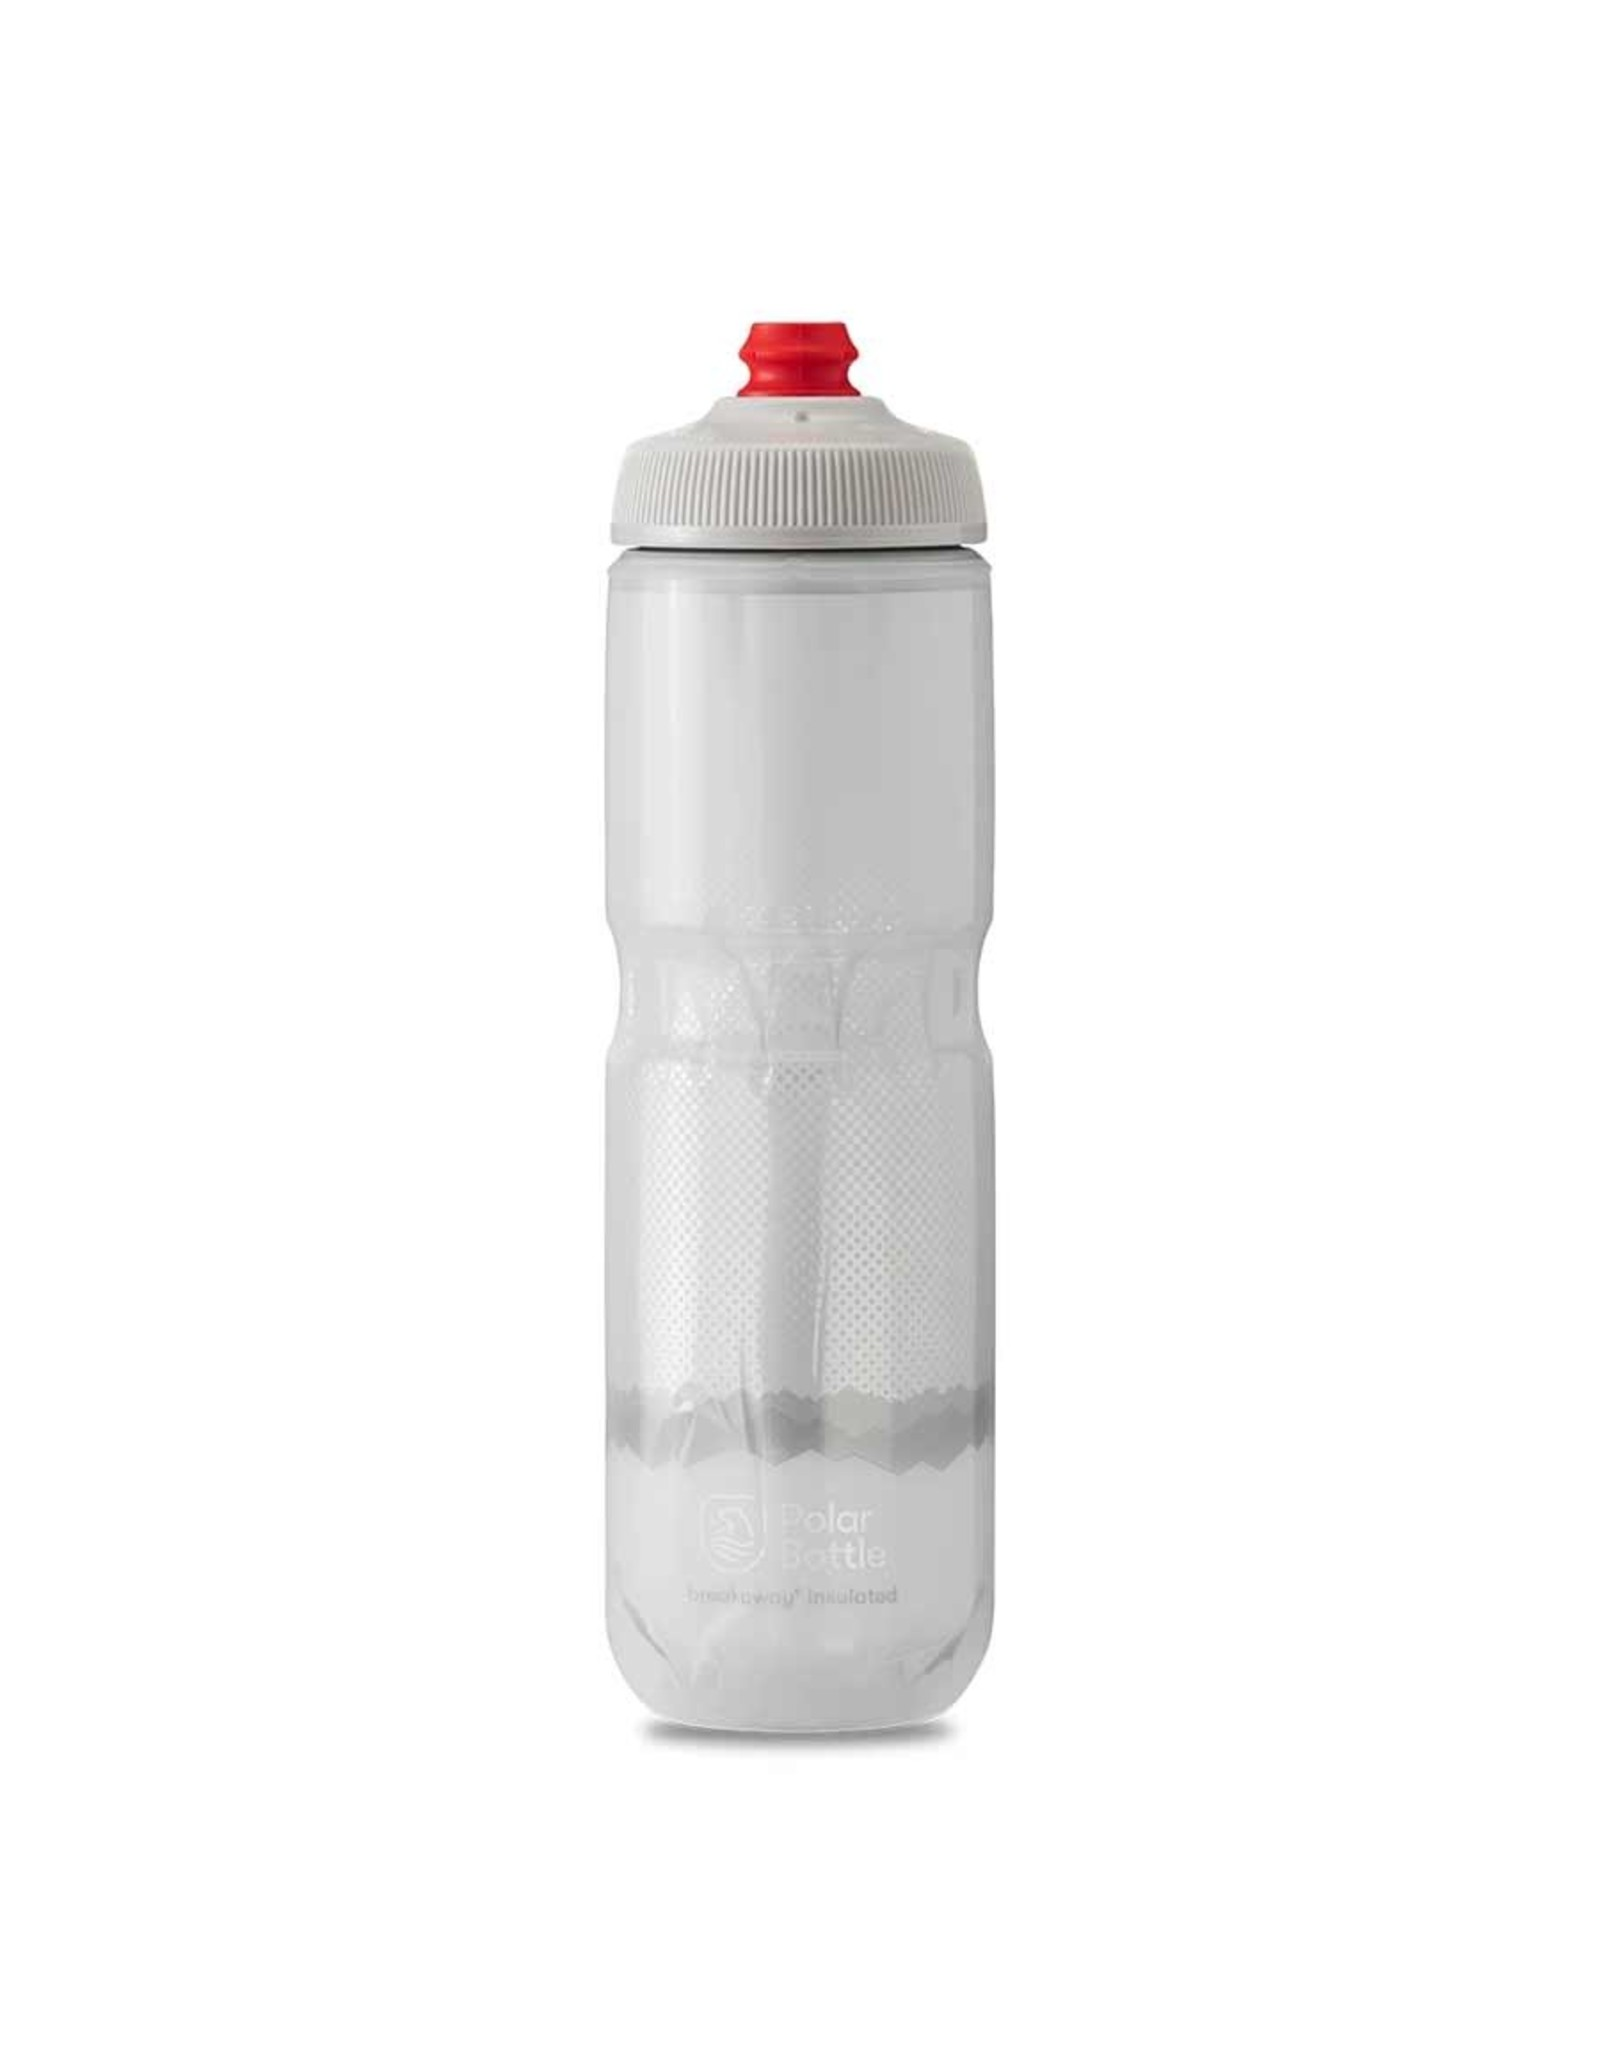 Polar Bottle Polar - Breakaway Insulated 24oz, Water Bottle, 710ml / 24oz, White/Silver